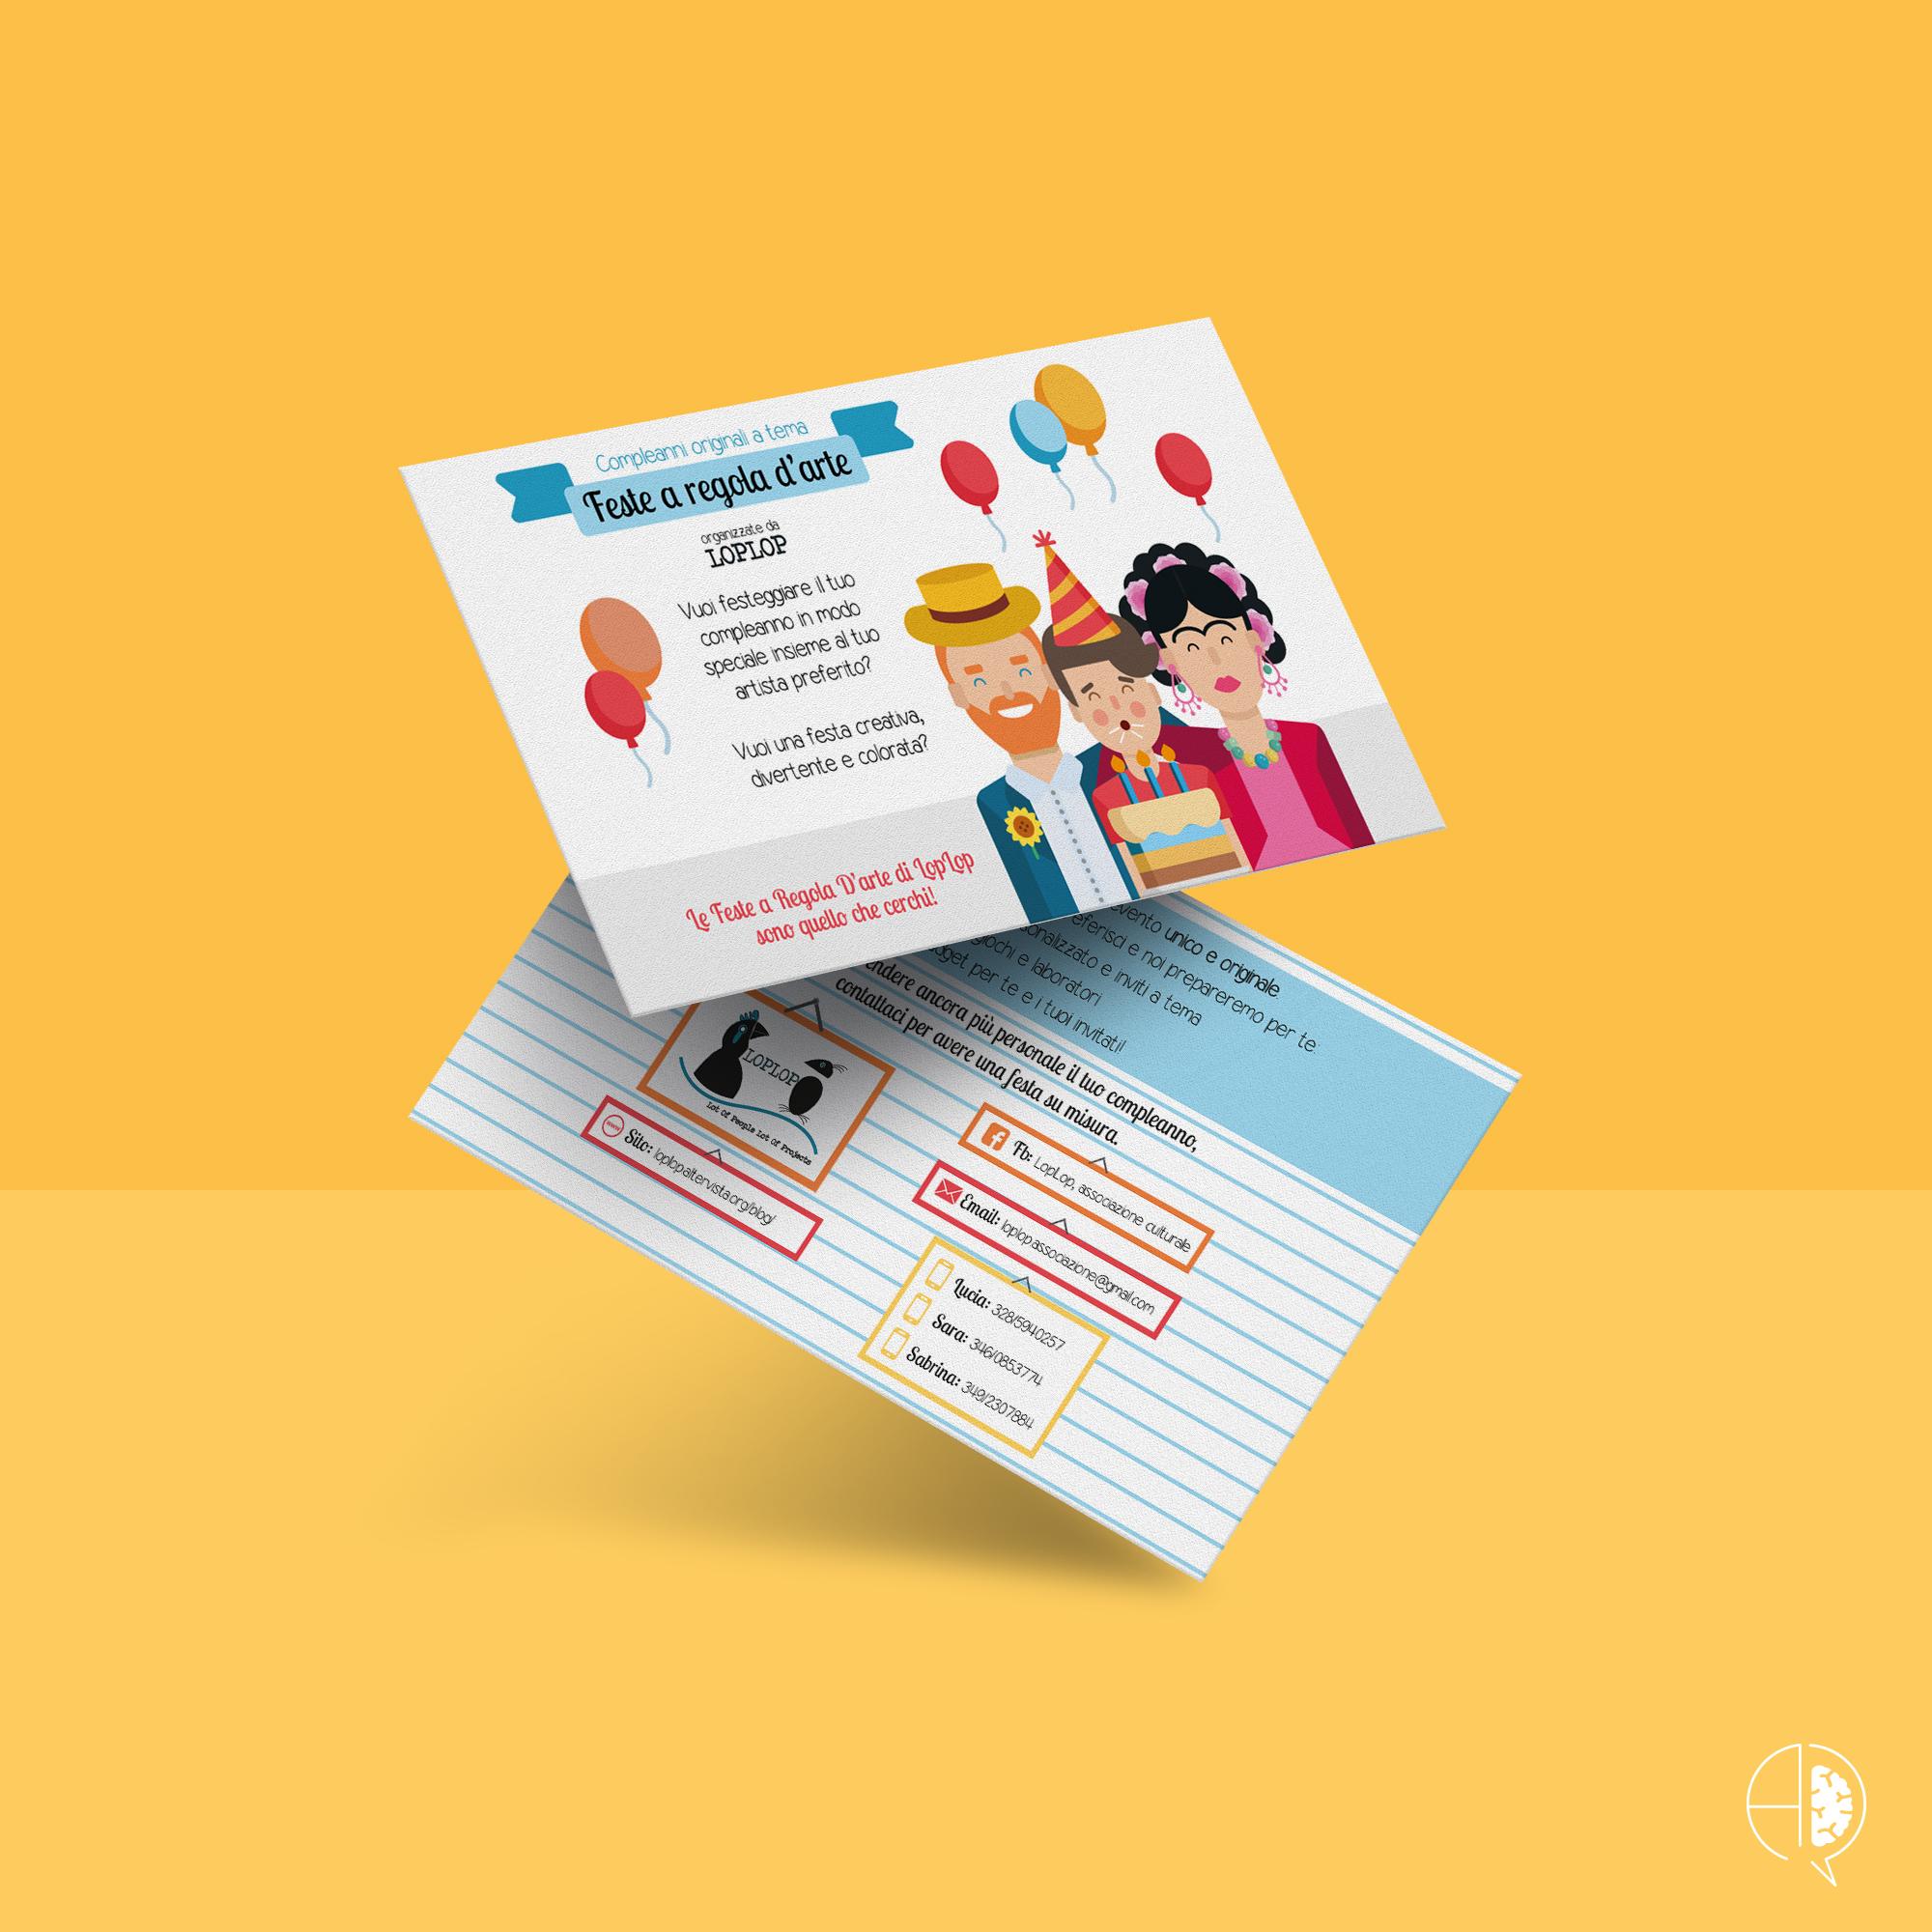 Cartoline per Associazione Culturale per la Triennale di Milano 2018